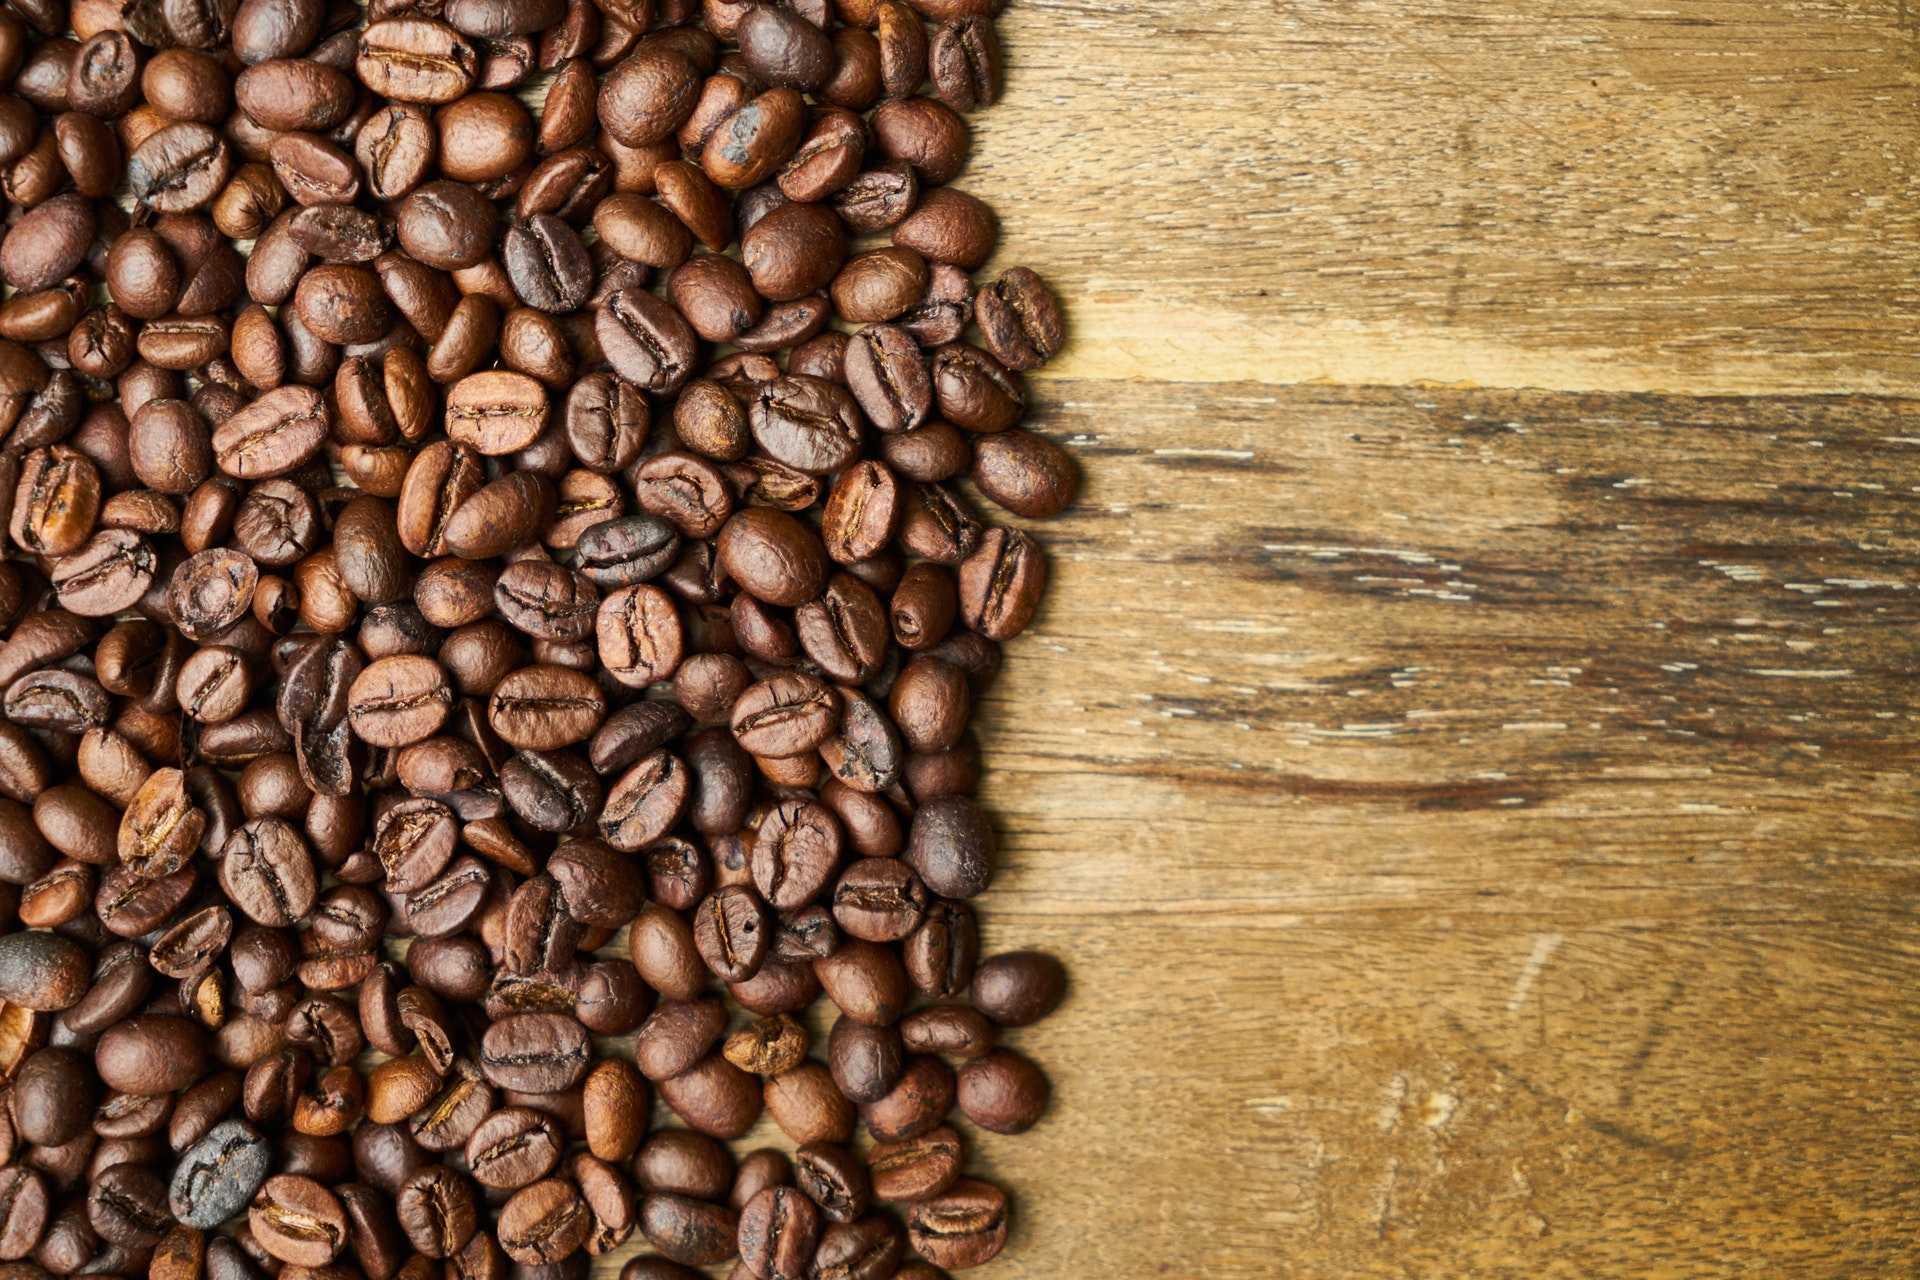 café de especialidad peruano Café de Especialidad Peruano Caf   de especialidad